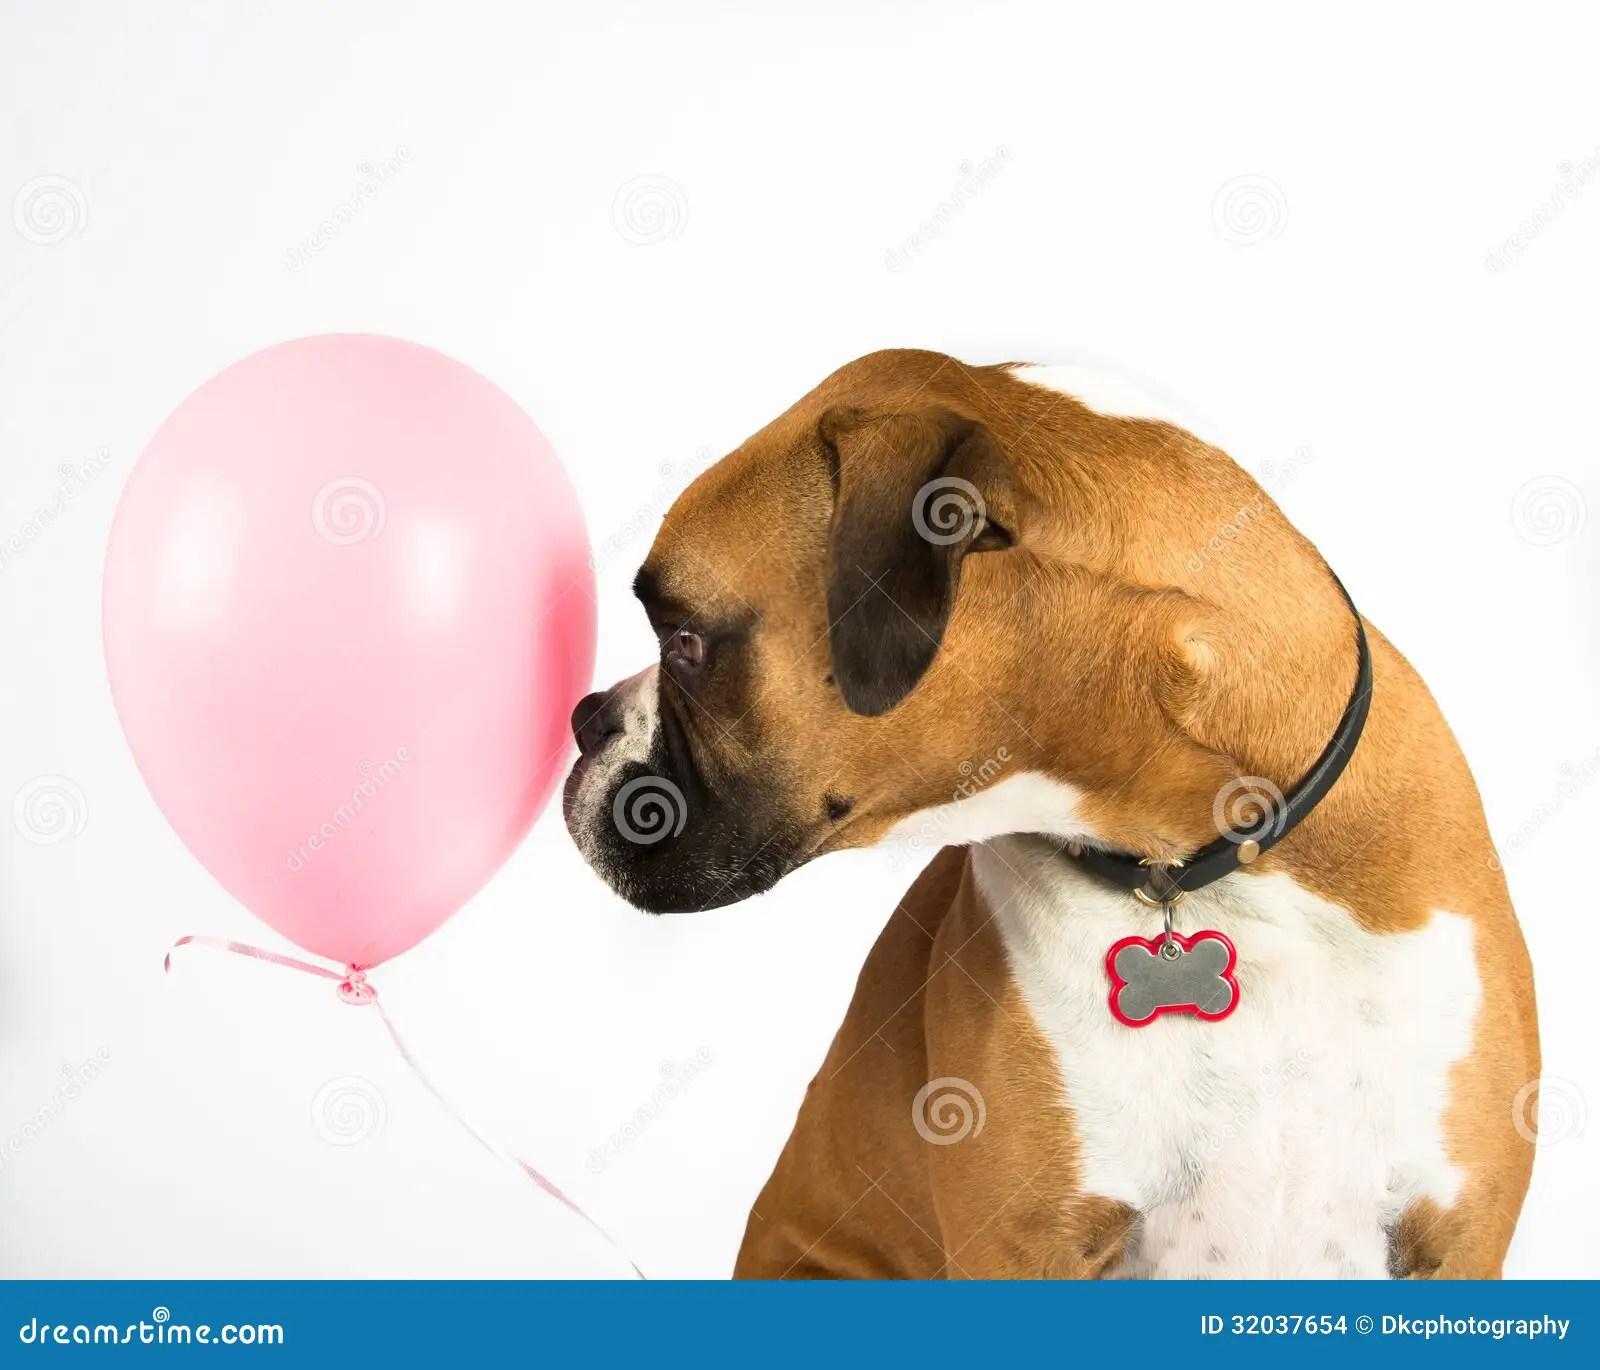 167 Boxer Dog Balloon Photos Free Royalty Free Stock Photos From Dreamstime